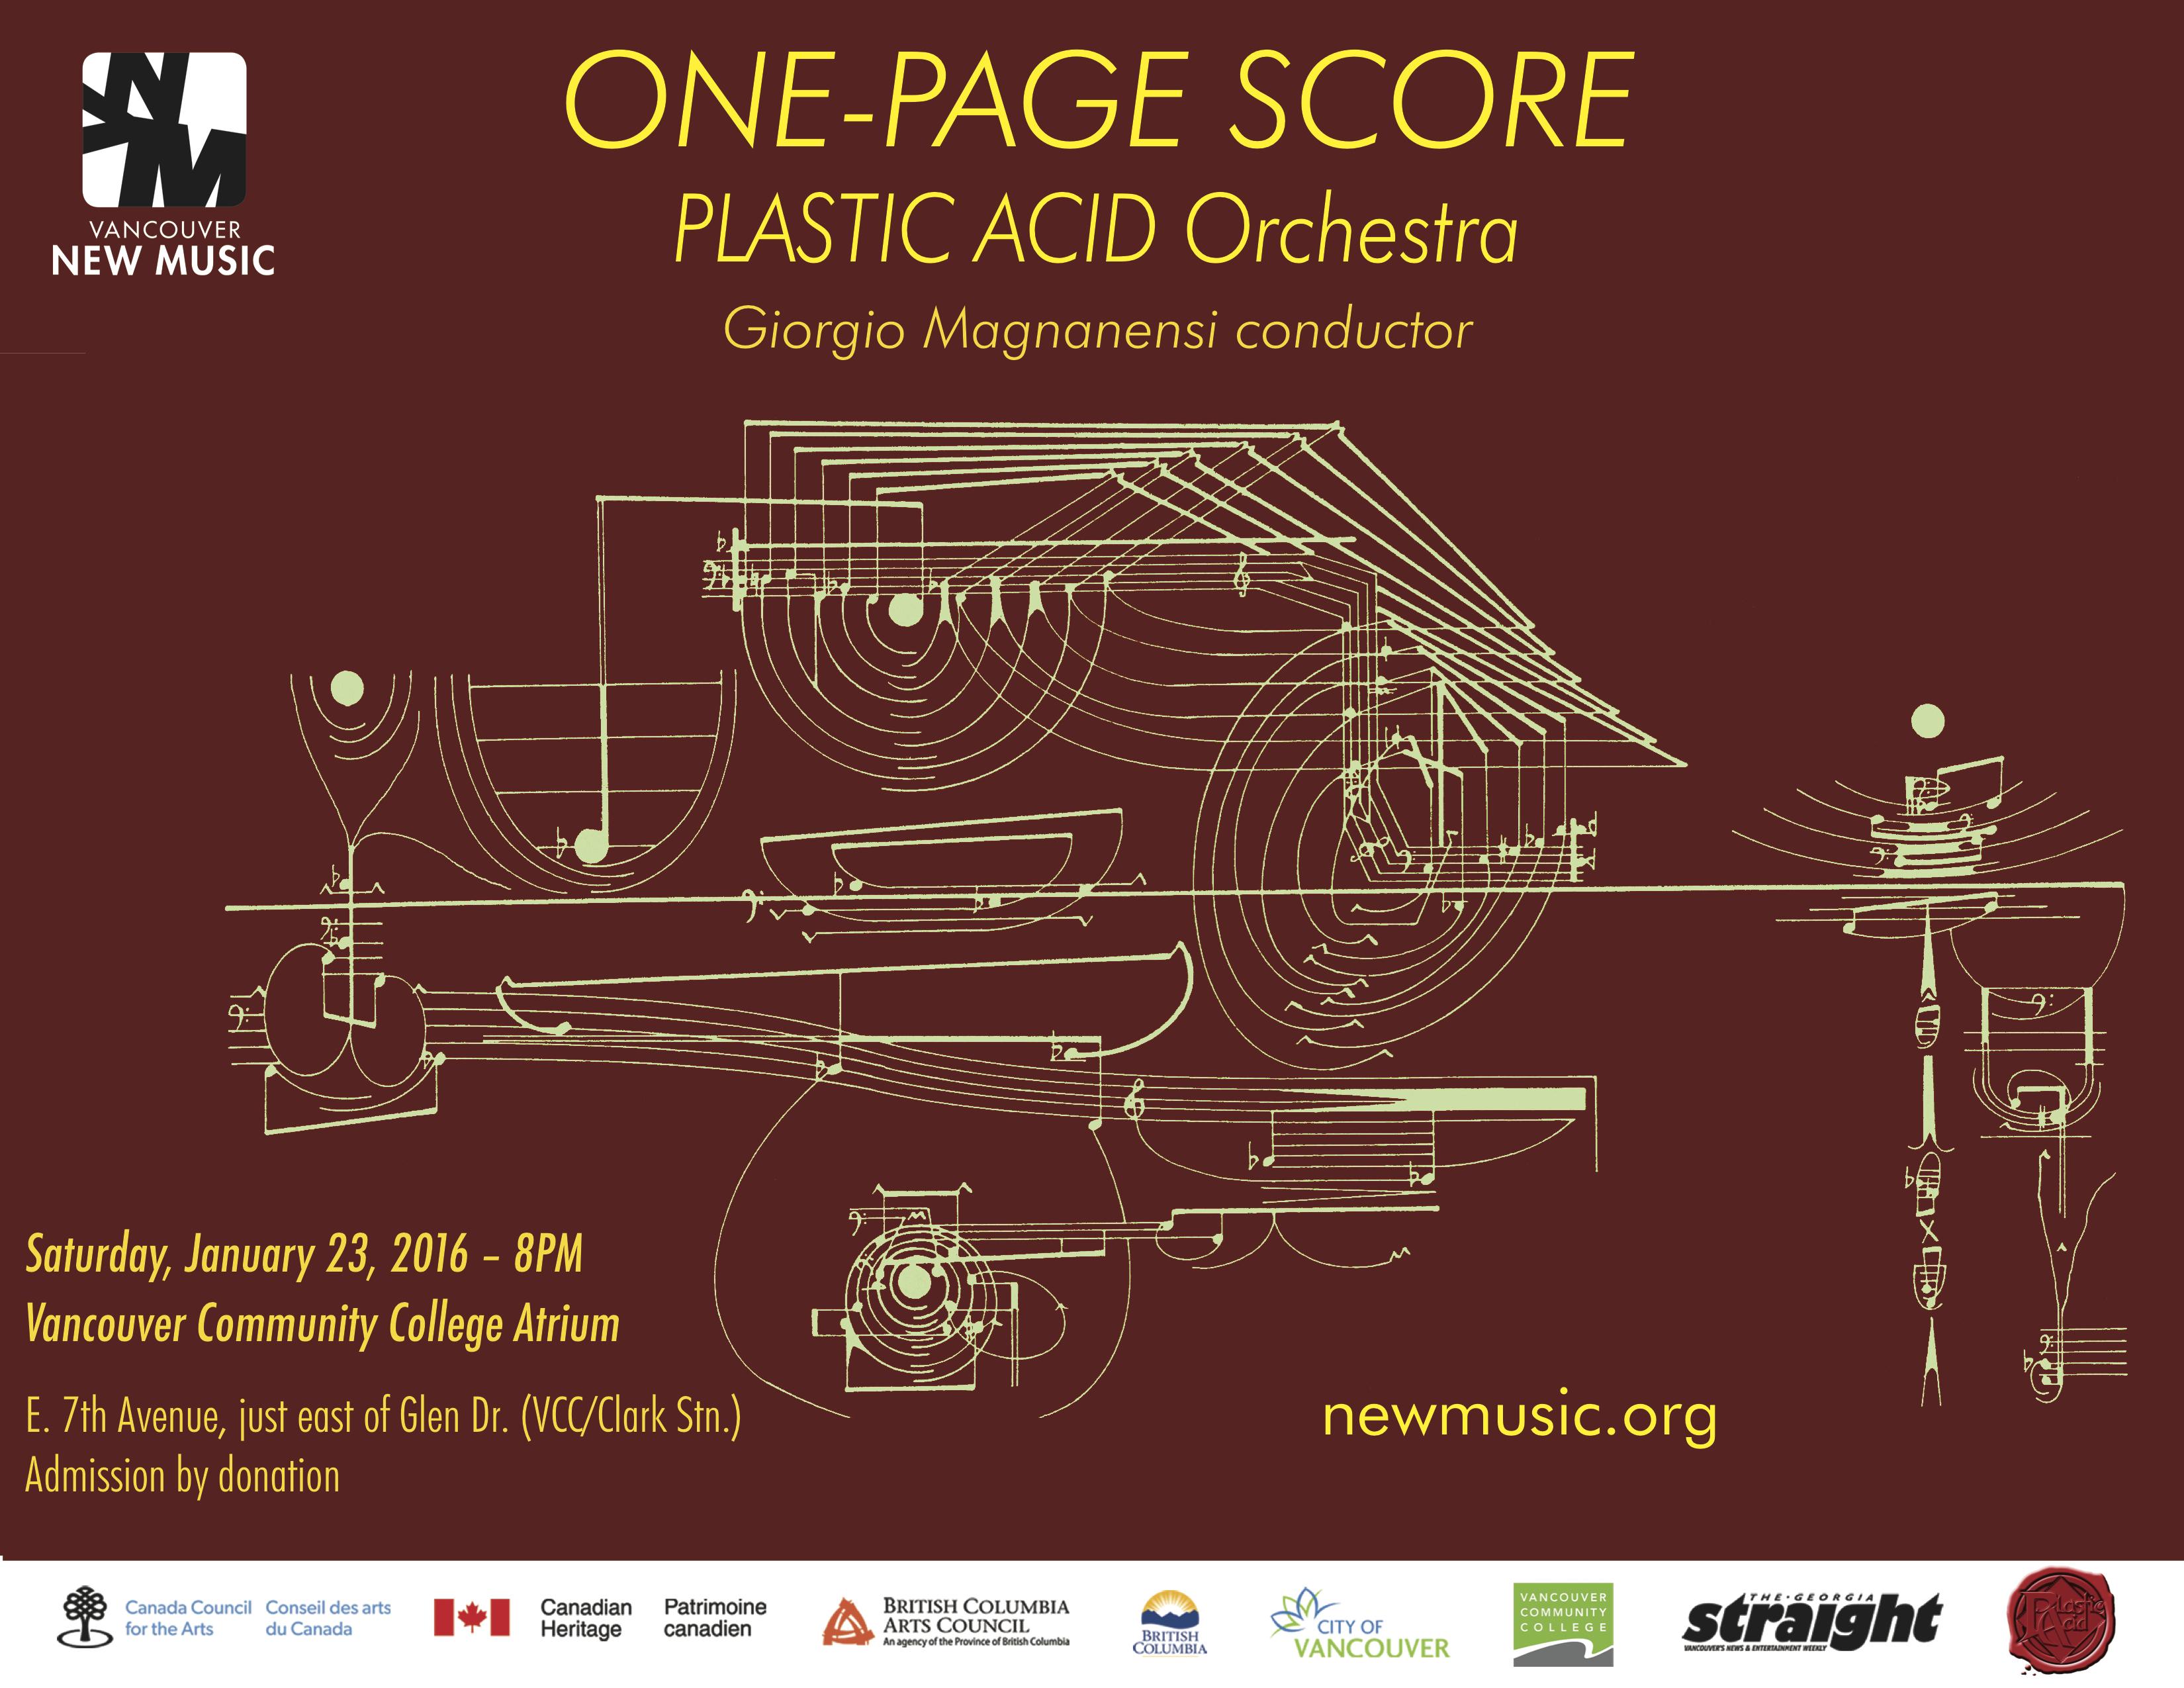 ONE-PAGE SCORE E-Poster